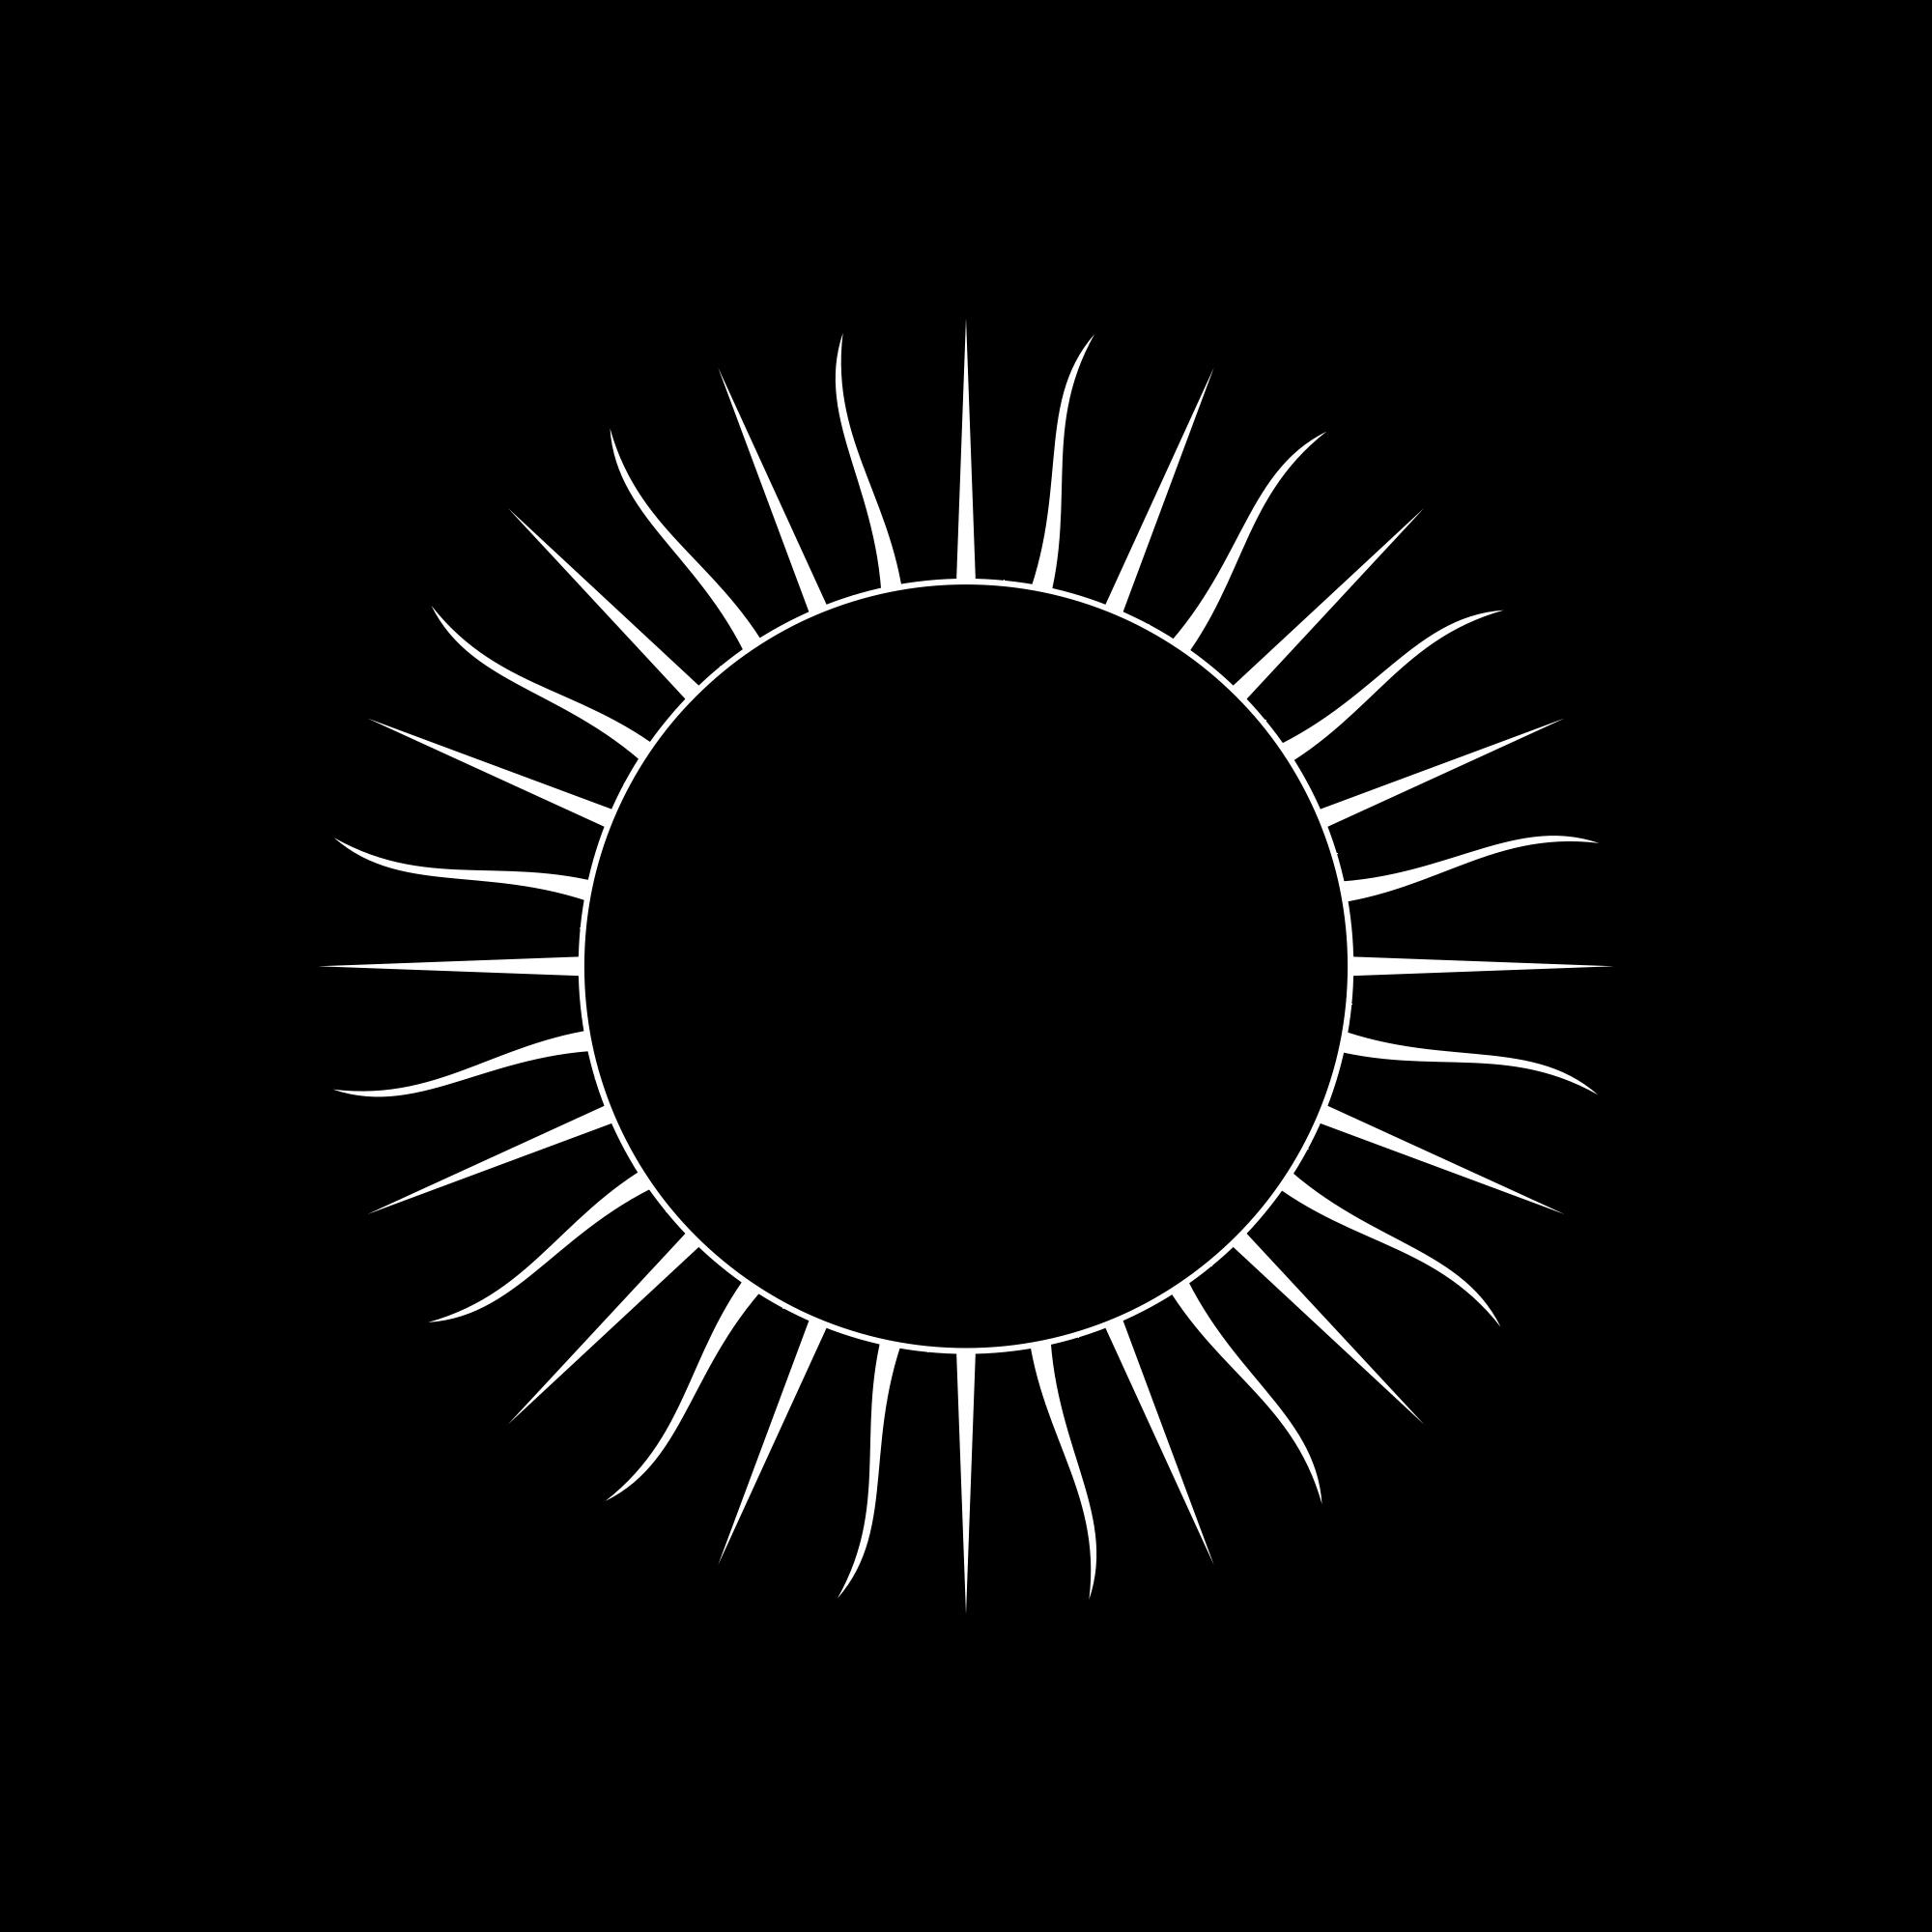 Black Sun PNG - 155152